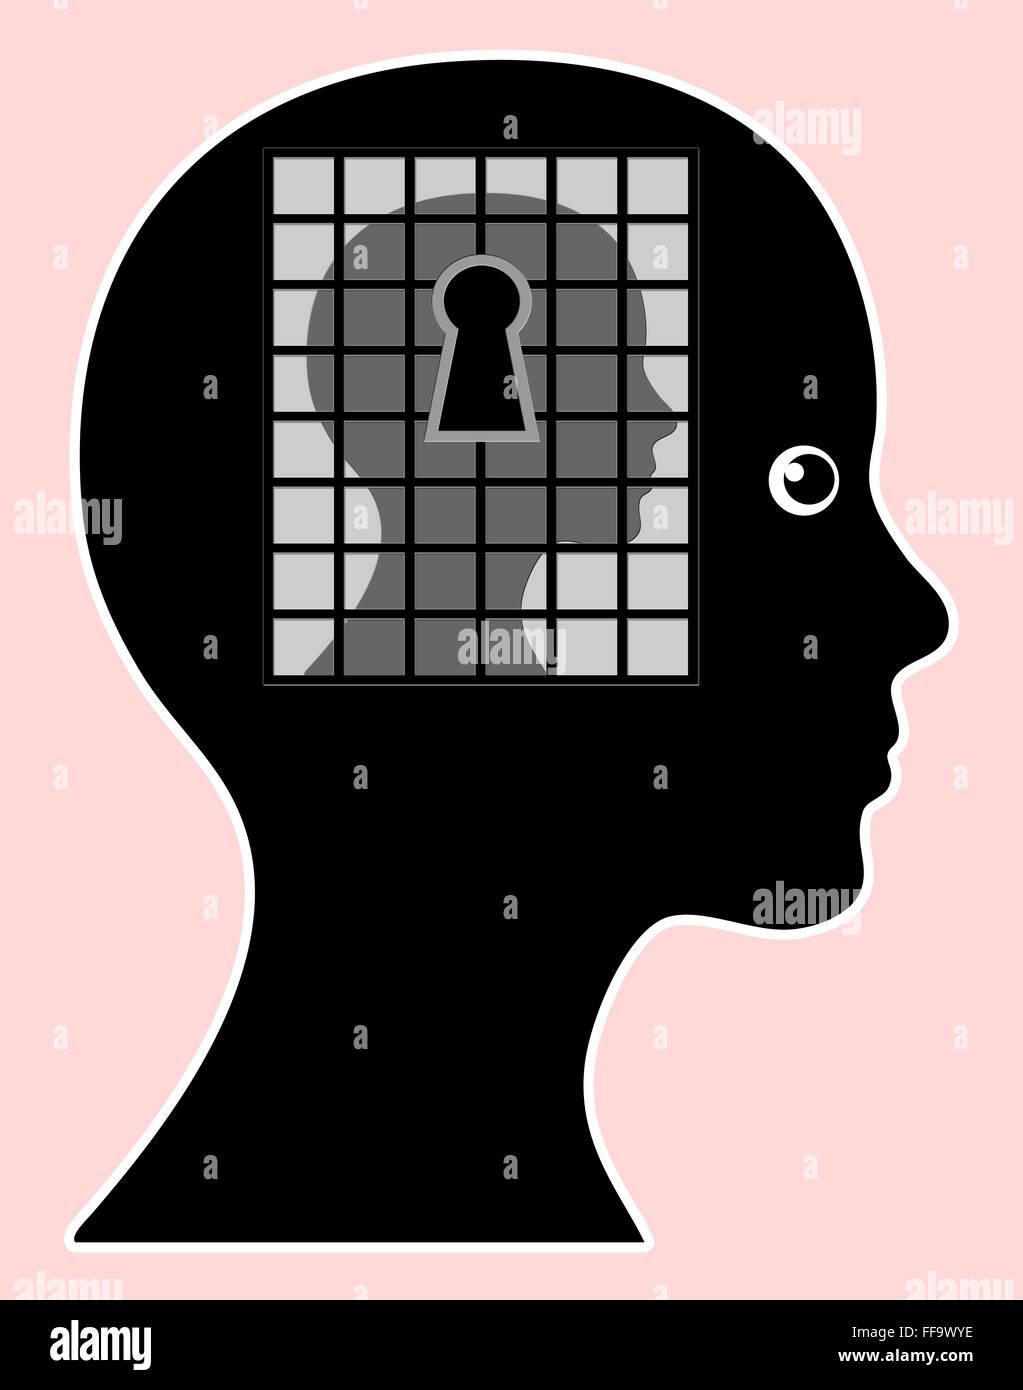 Mind Made Prison - Stock Image